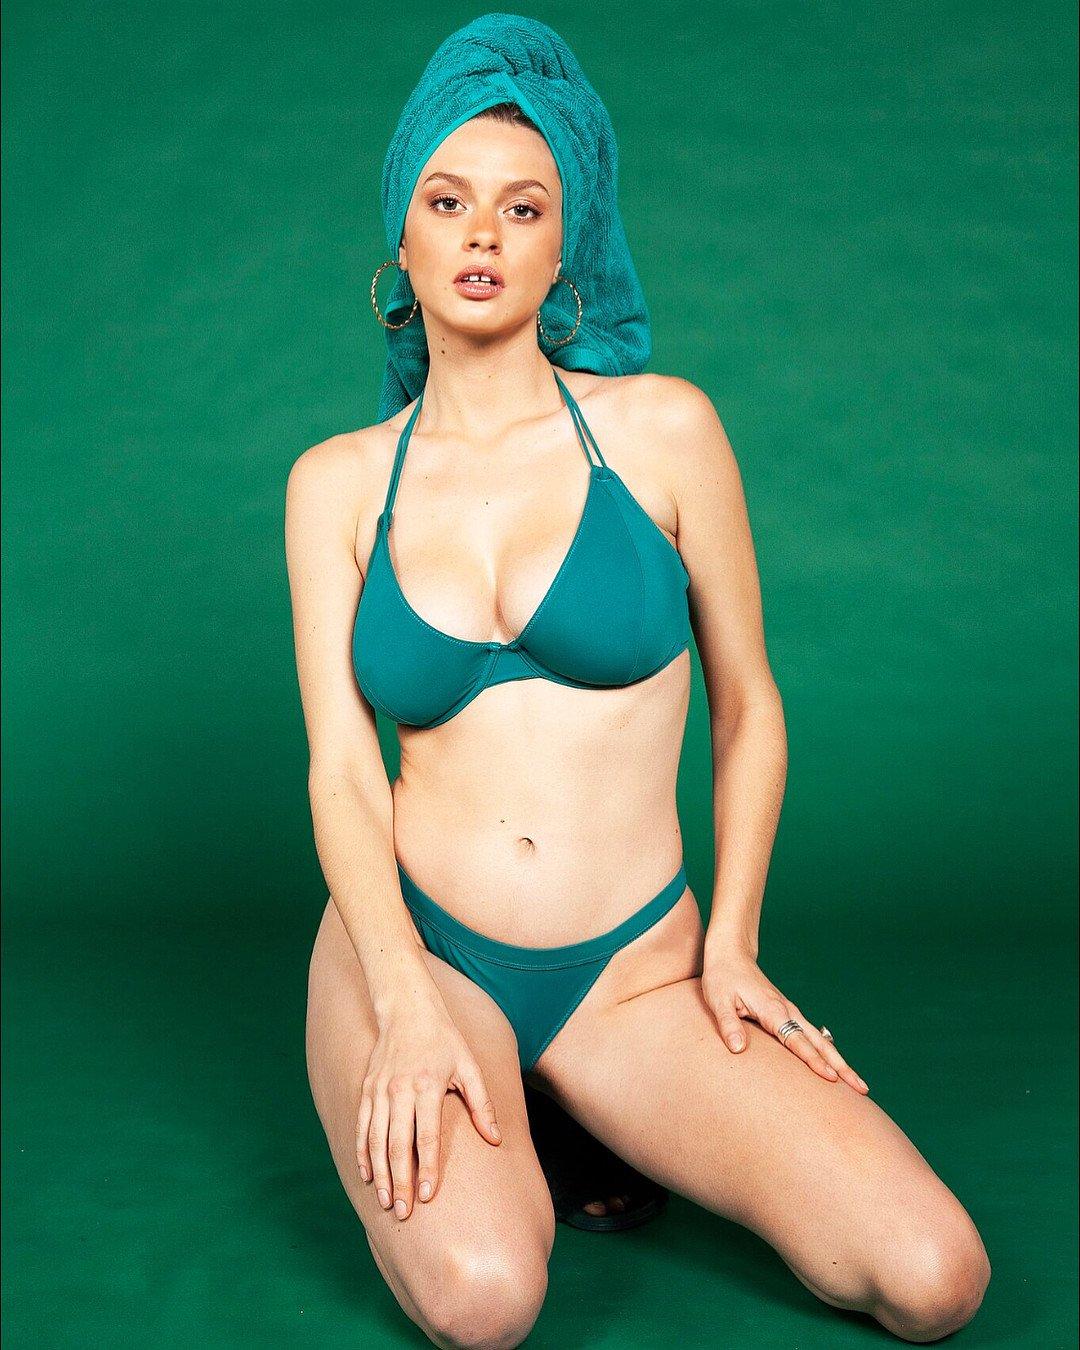 Bikini Elle Brittain naked (54 photo), Pussy, Is a cute, Instagram, underwear 2006